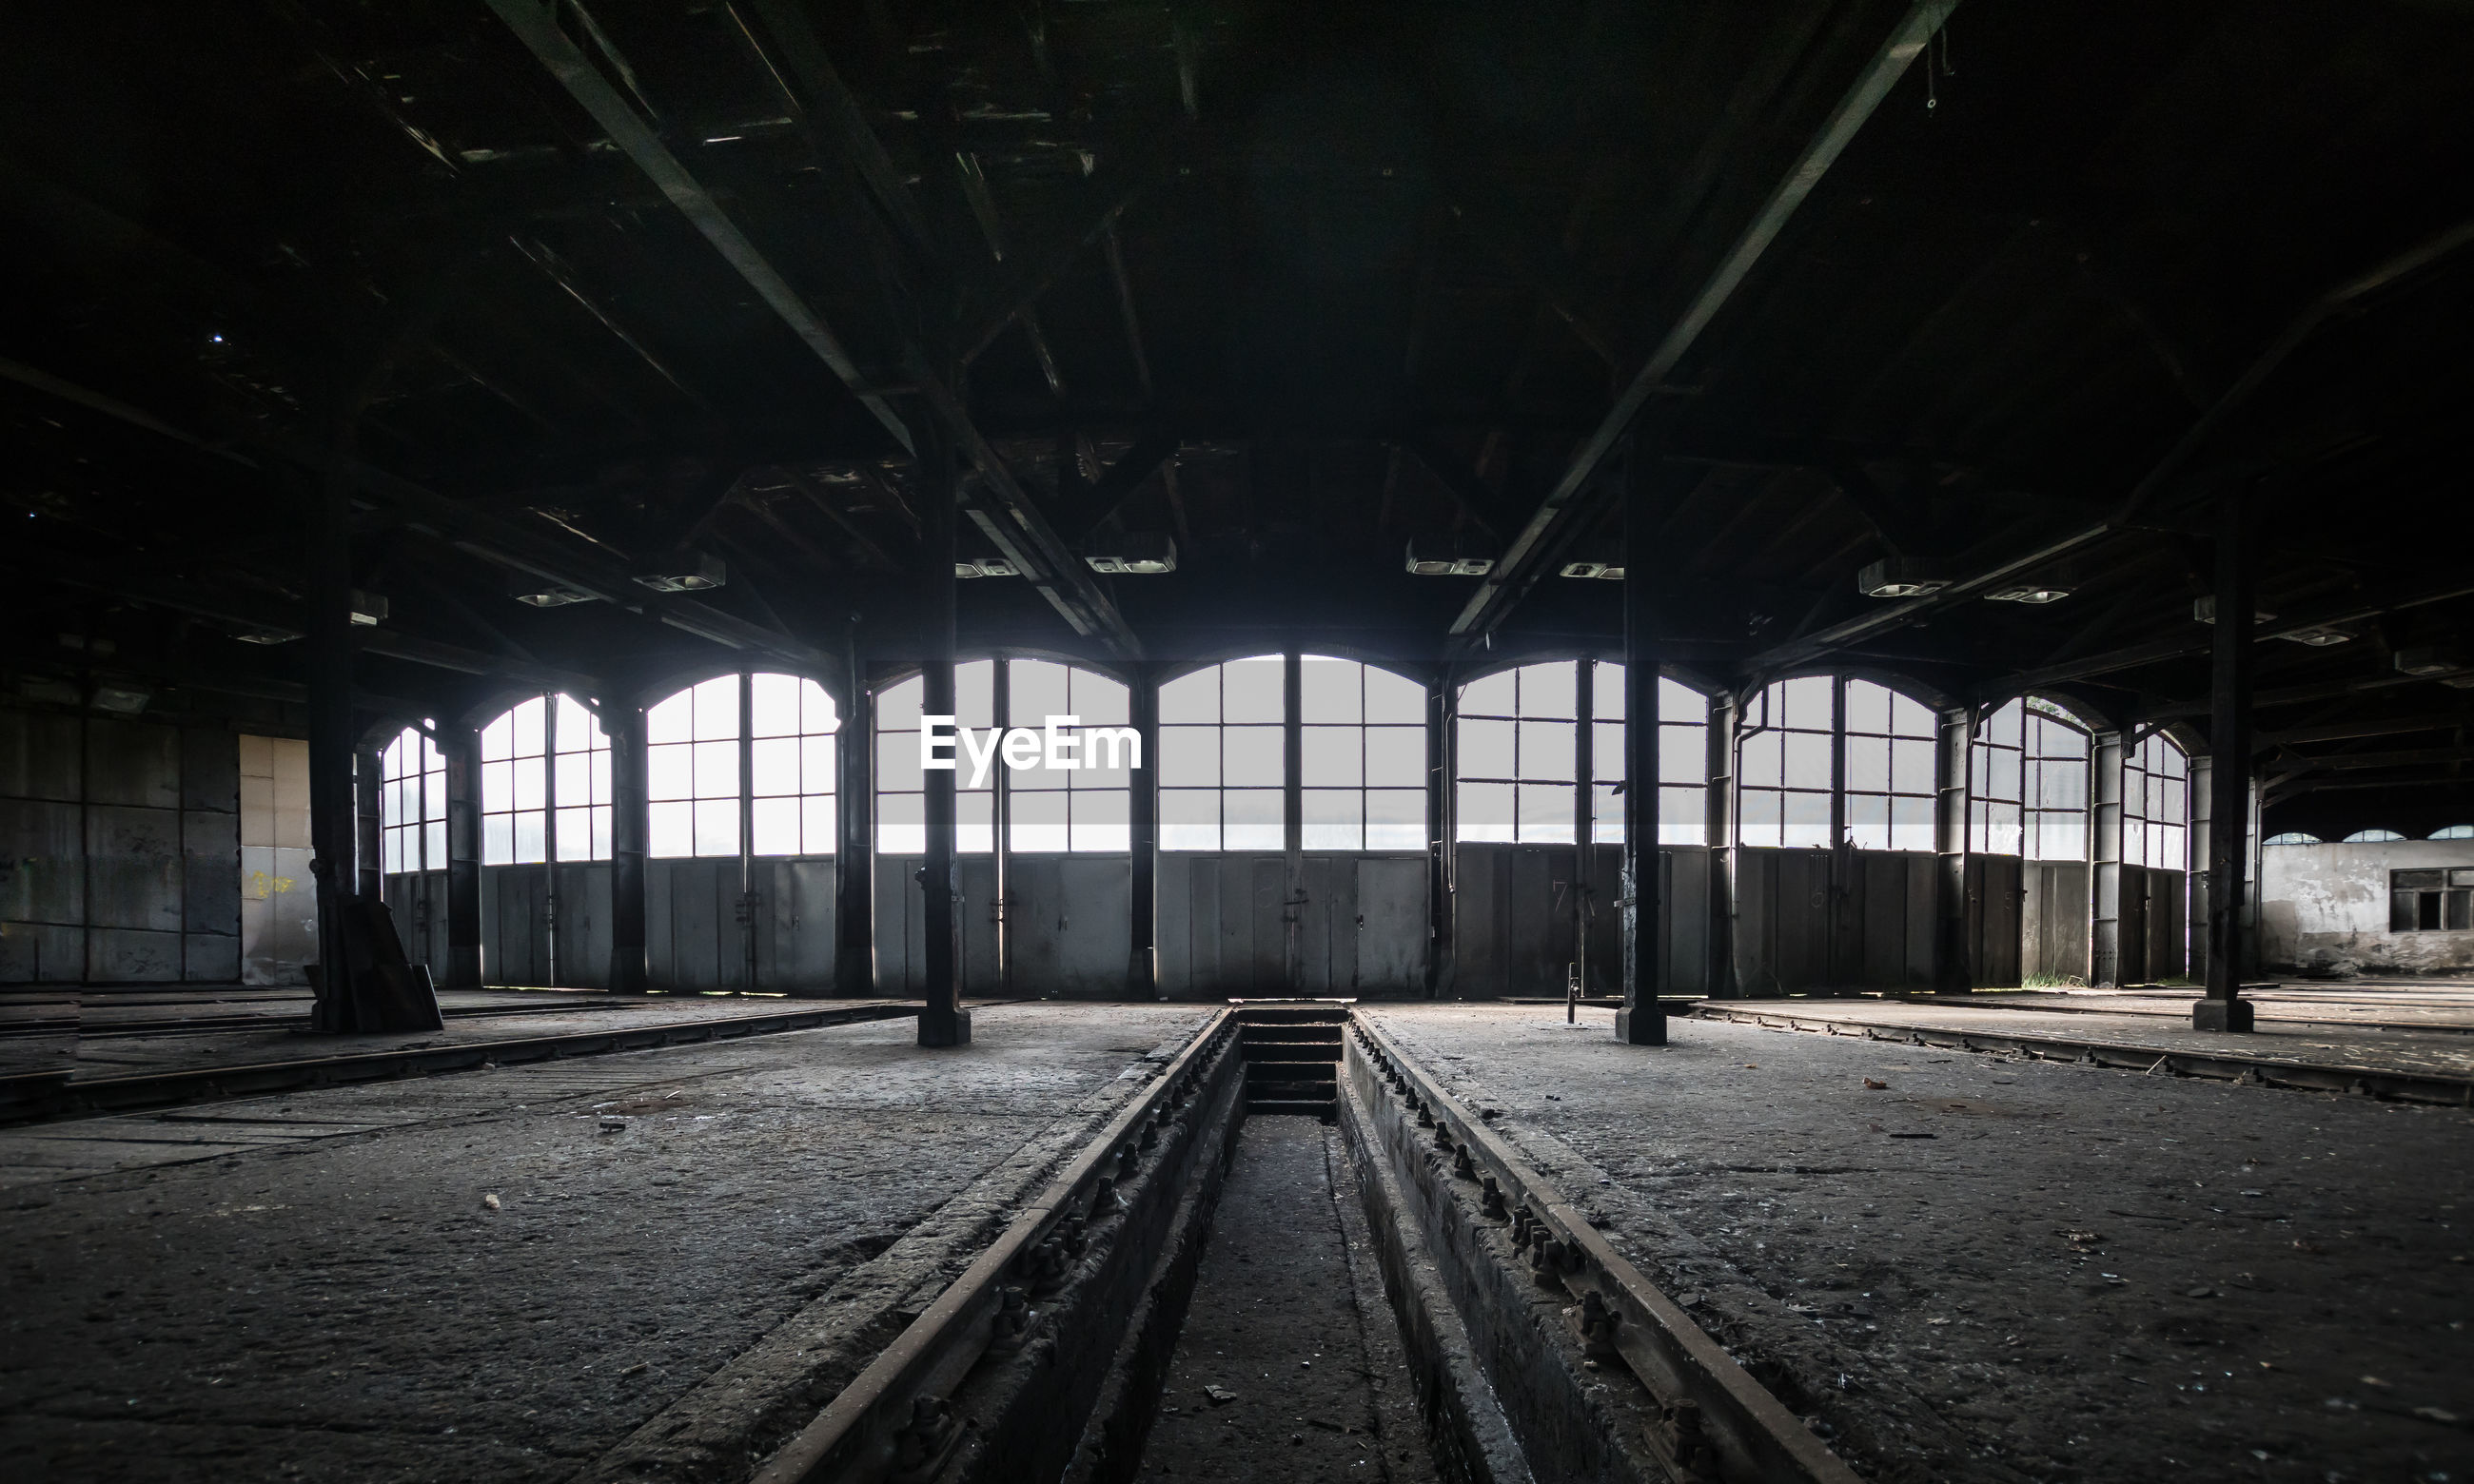 Railroad track at abandoned shed